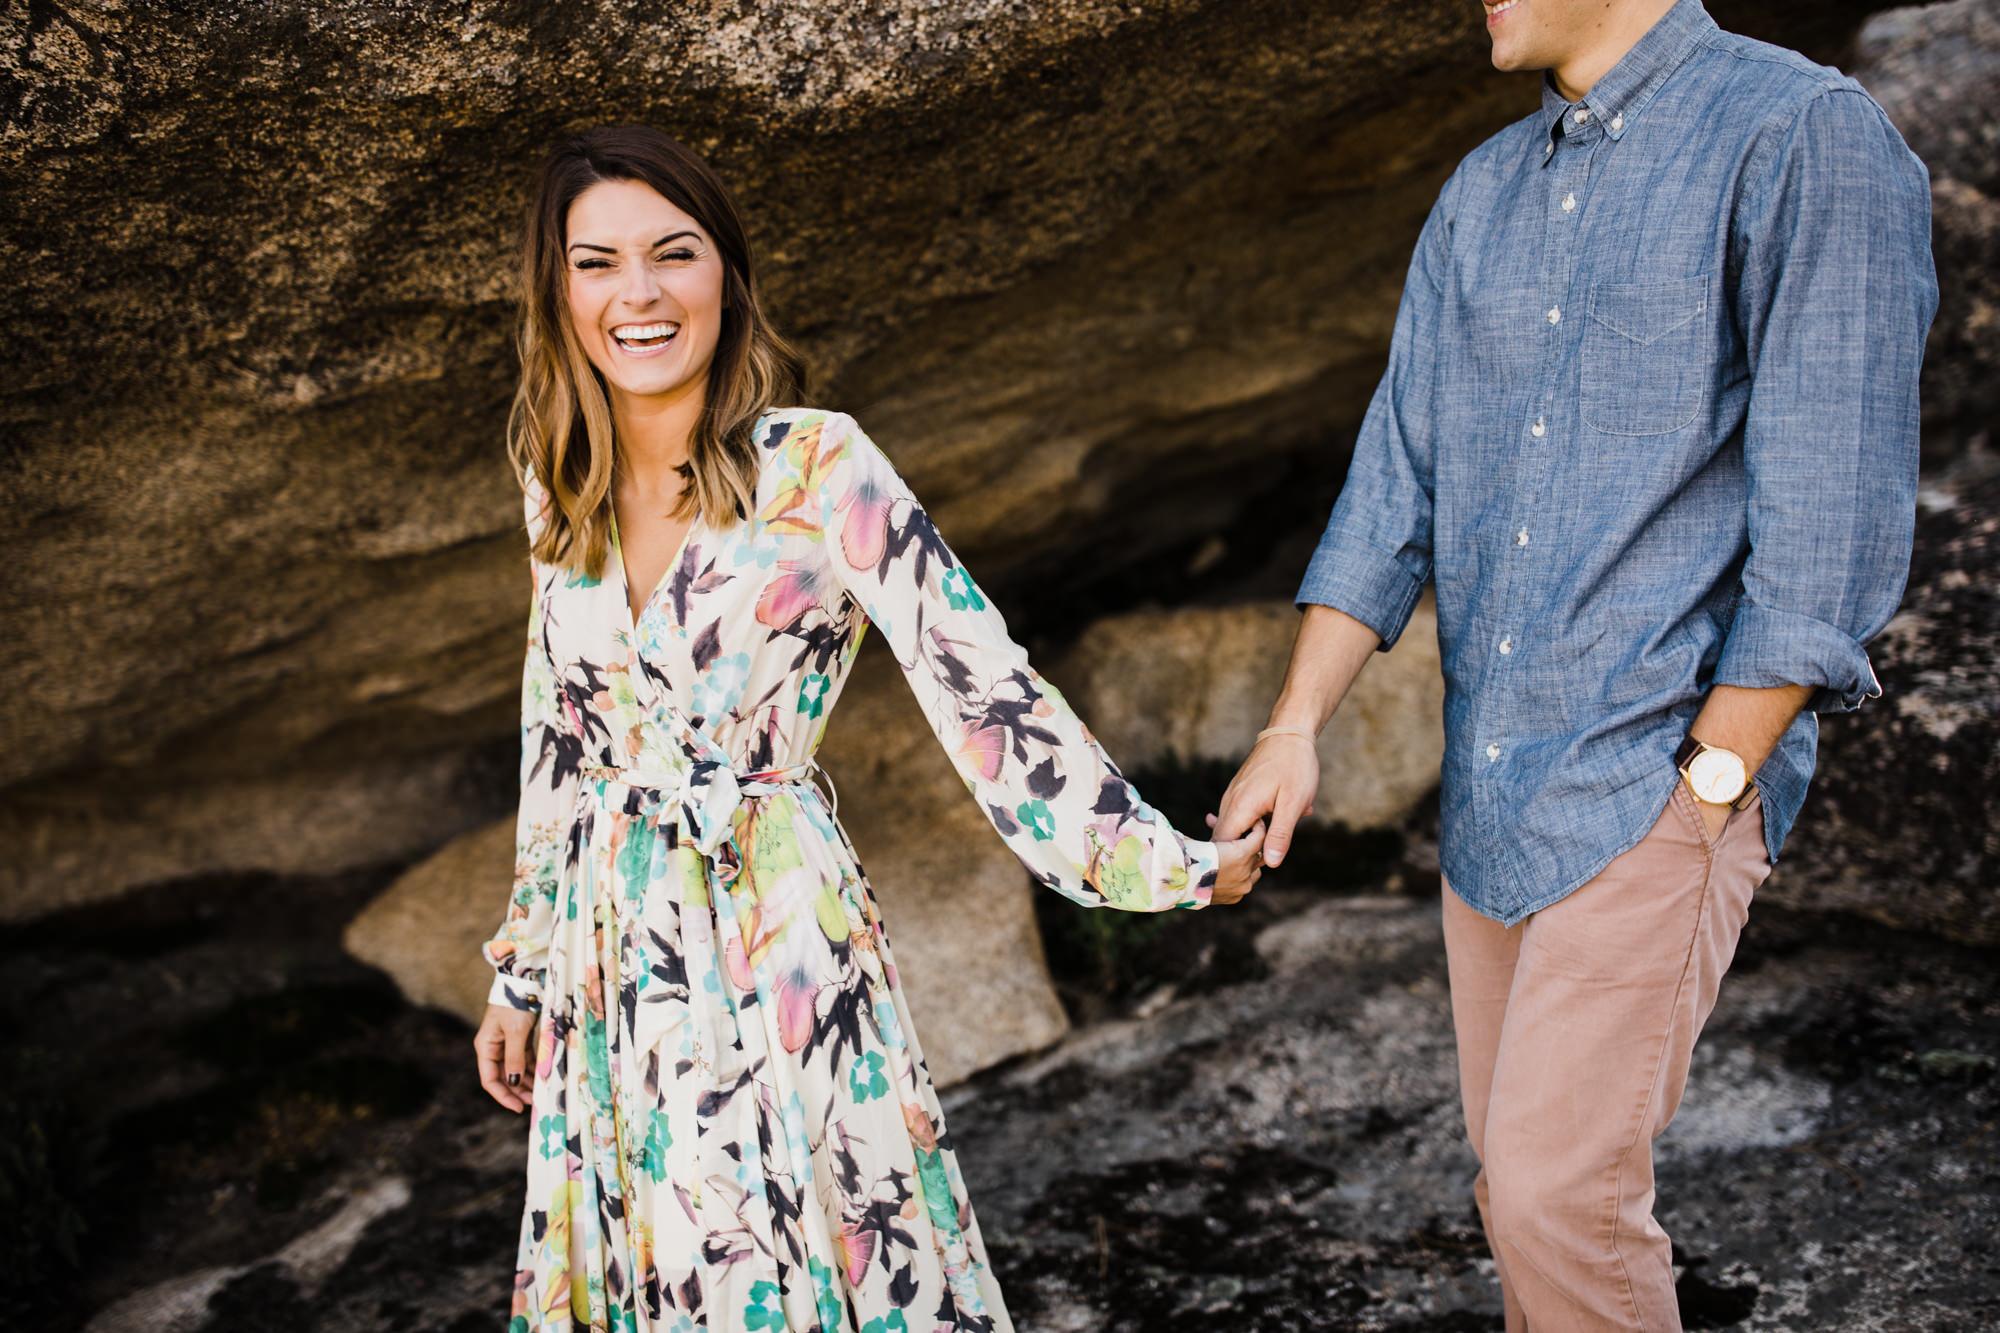 yosemite adventure session | national park wedding photographer | california elopement inspiration | www.thehearnes.com